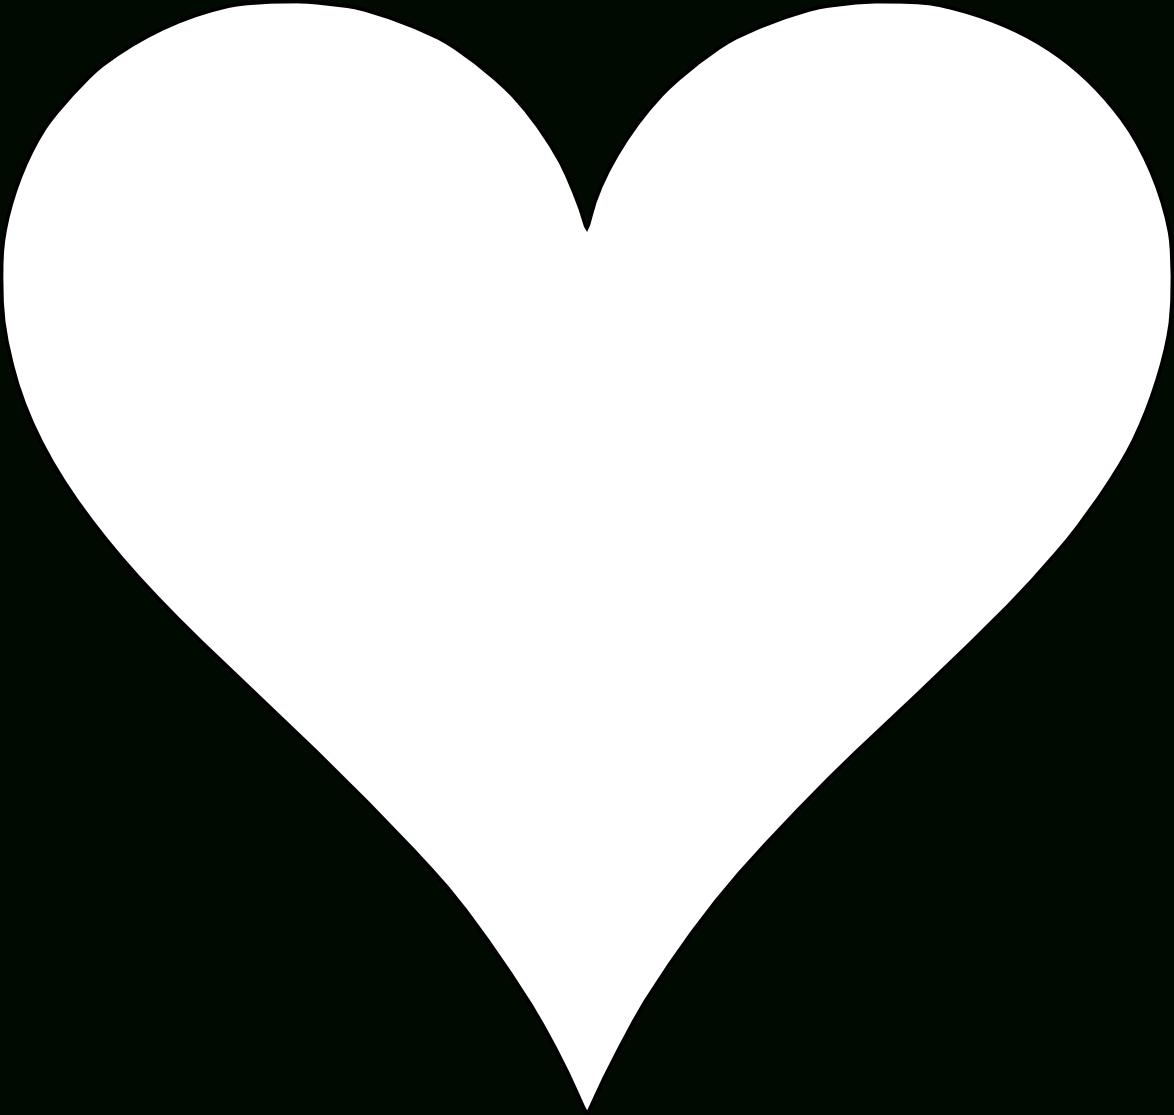 Violetta: Centros De Mesa. Indicaciones. | Mariage | Pinterest - Free Printable Heart Templates